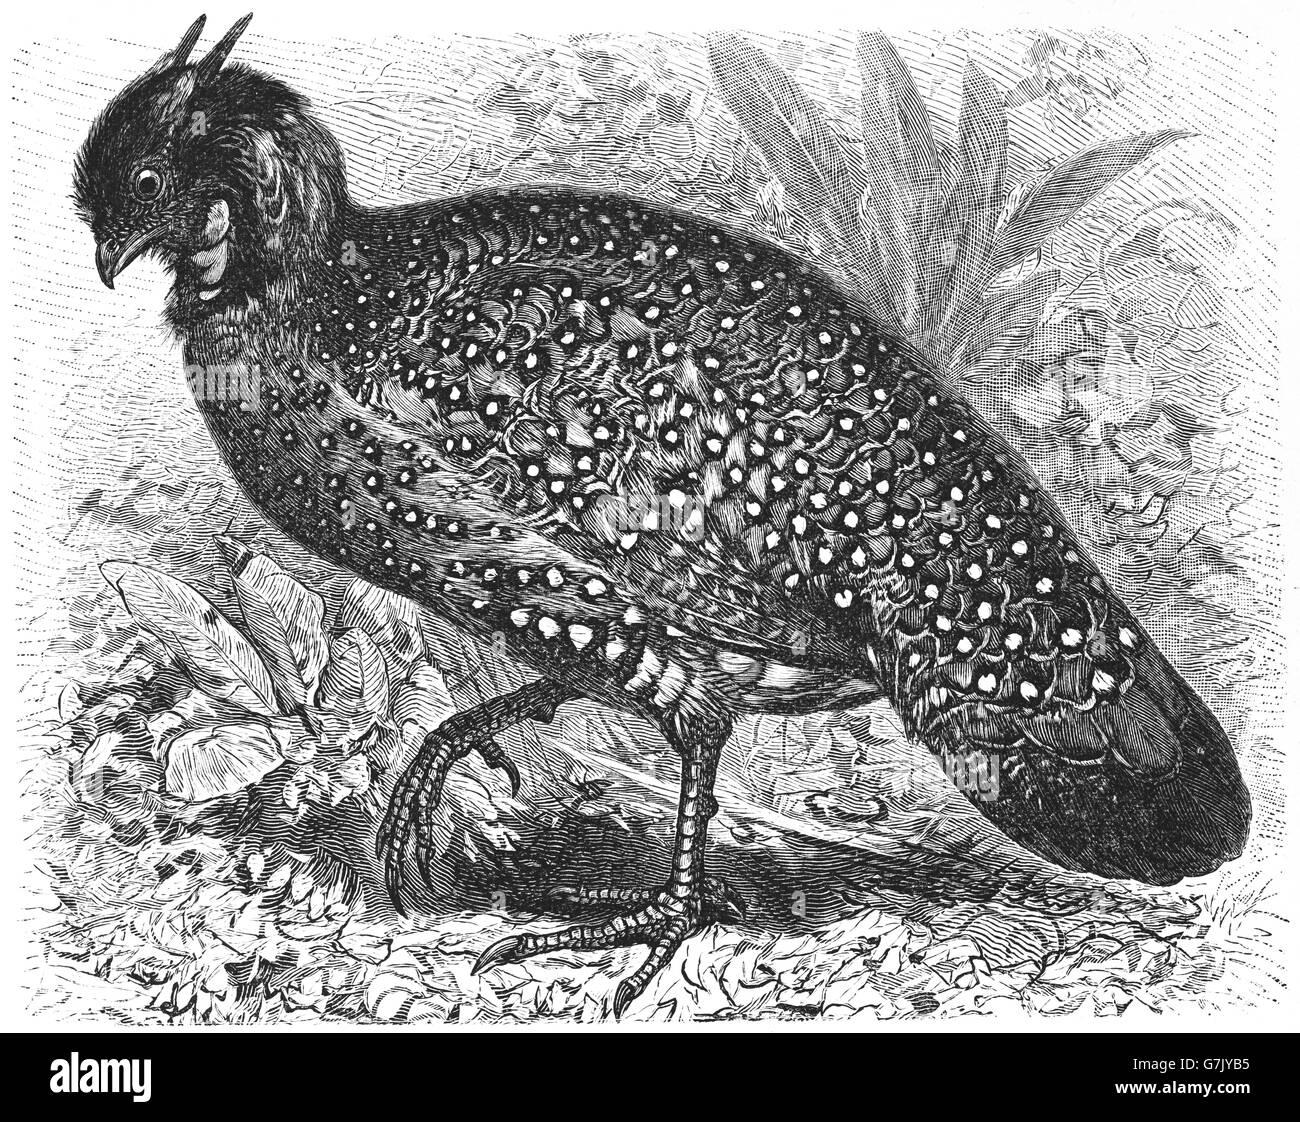 Pheasant Bird Illustration Stock Photos & Pheasant Bird Illustration ...